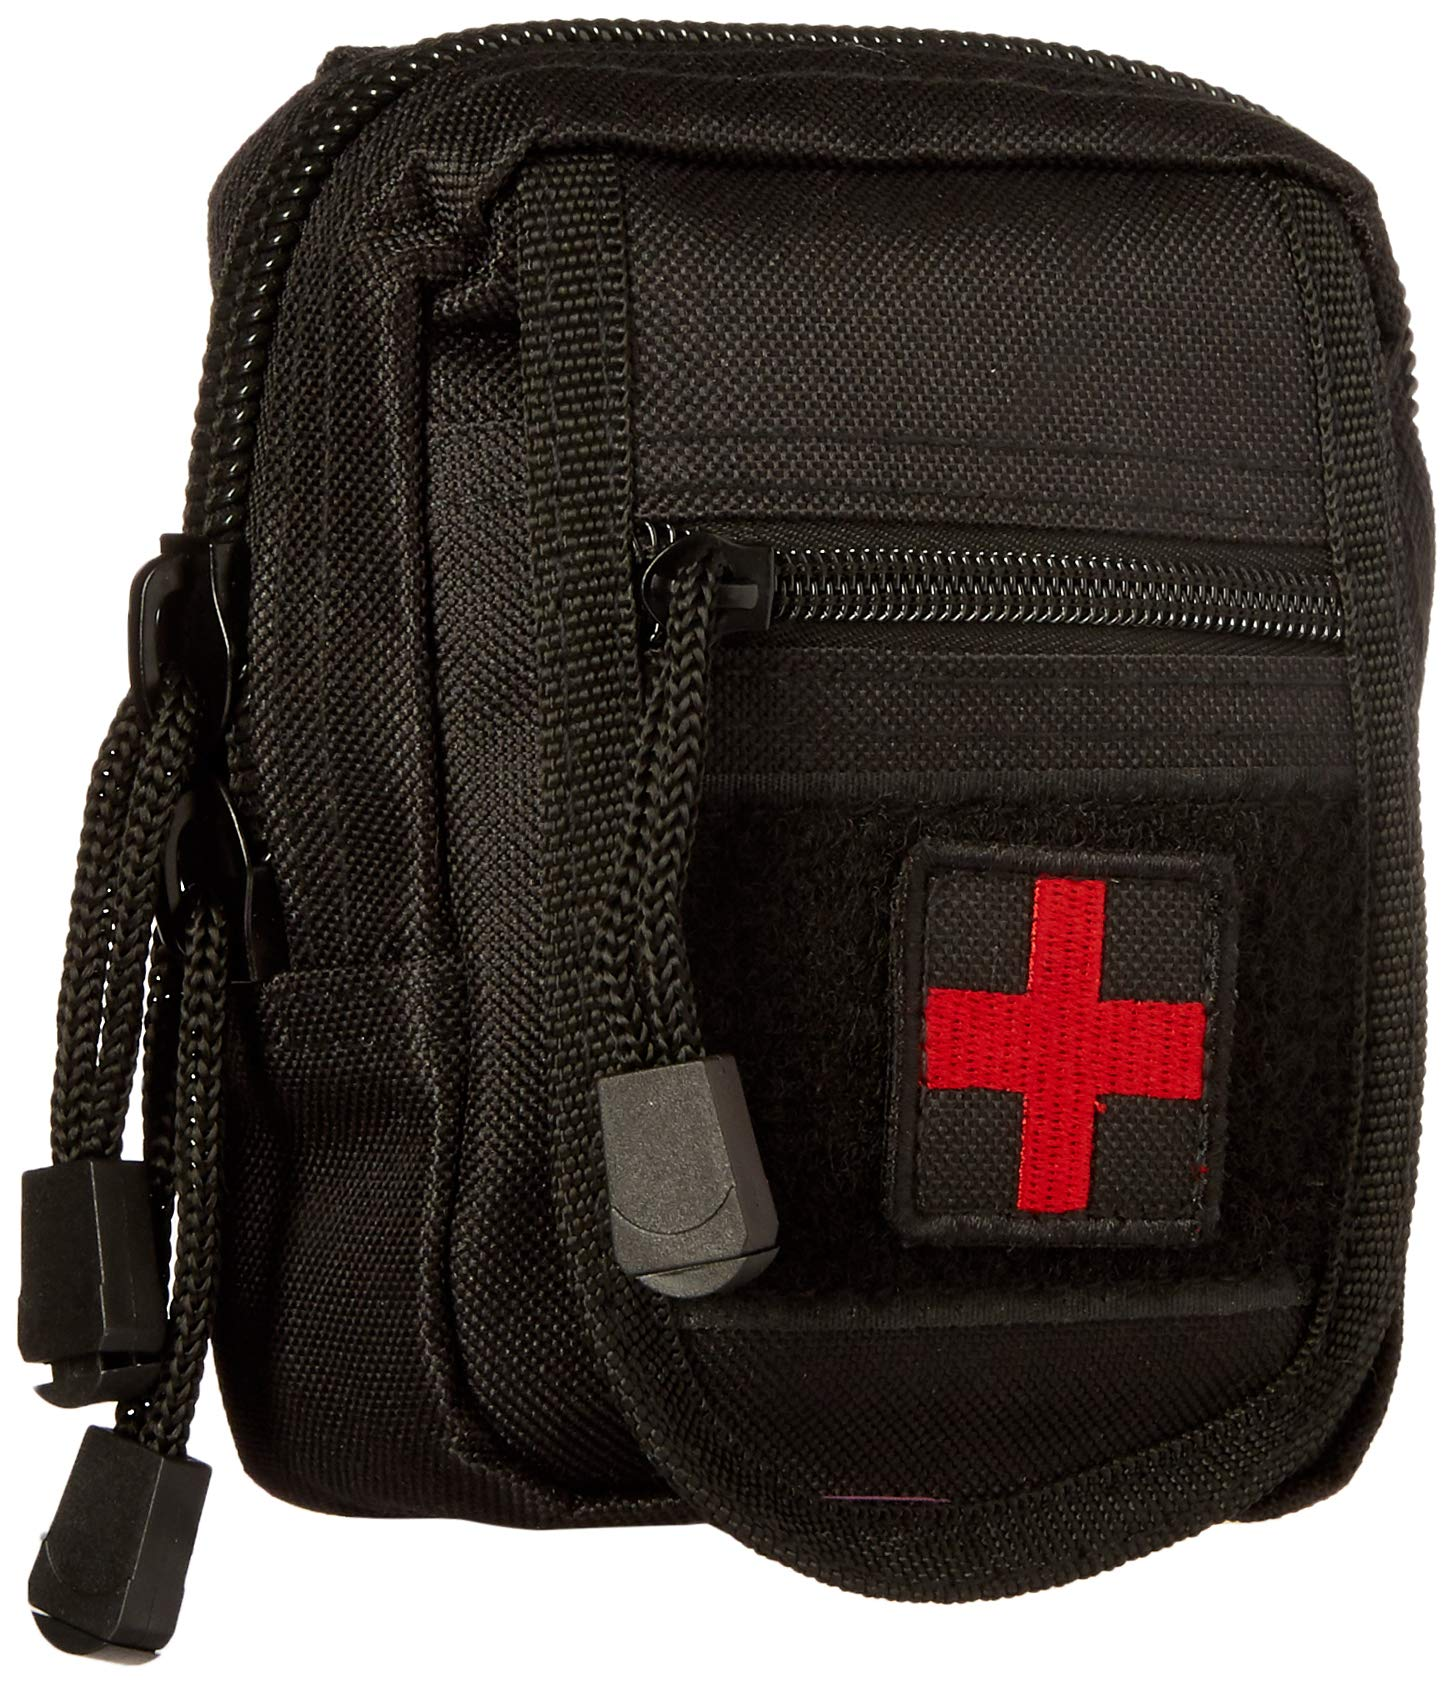 NcStar Compact Trauma Kit 1 Black by NcSTAR (Image #1)